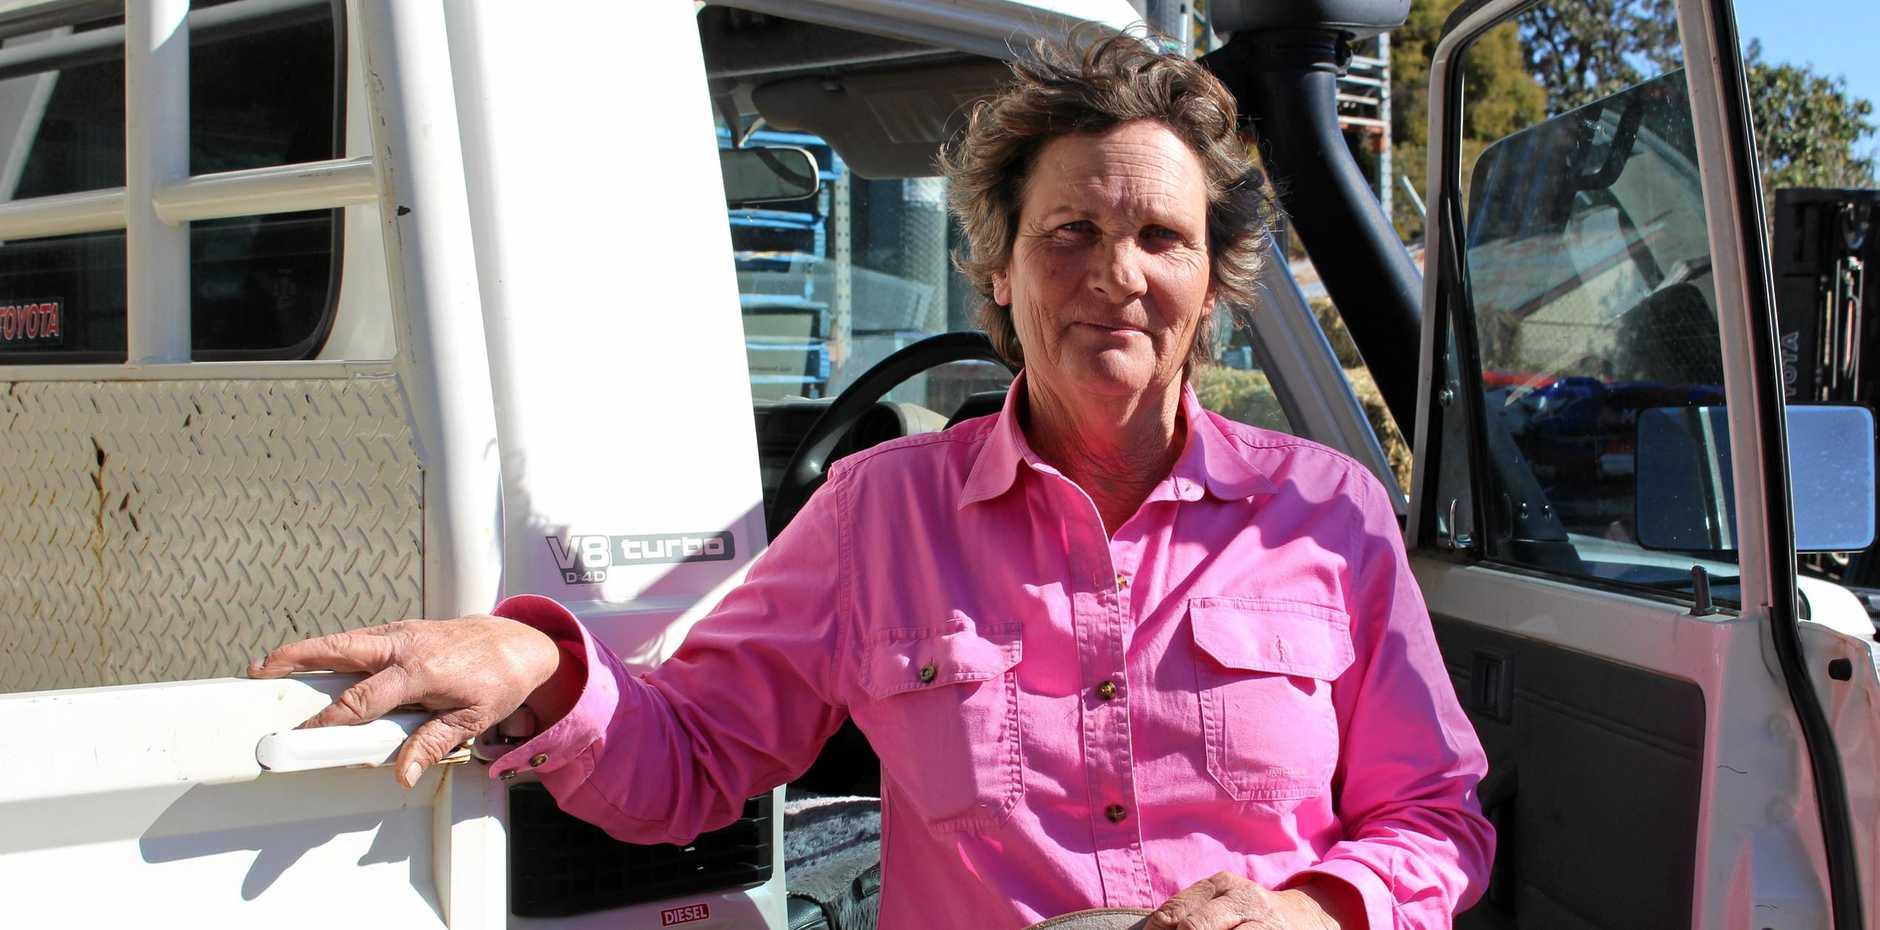 FLAT OUT: The Glen cattle farmer Dorothy